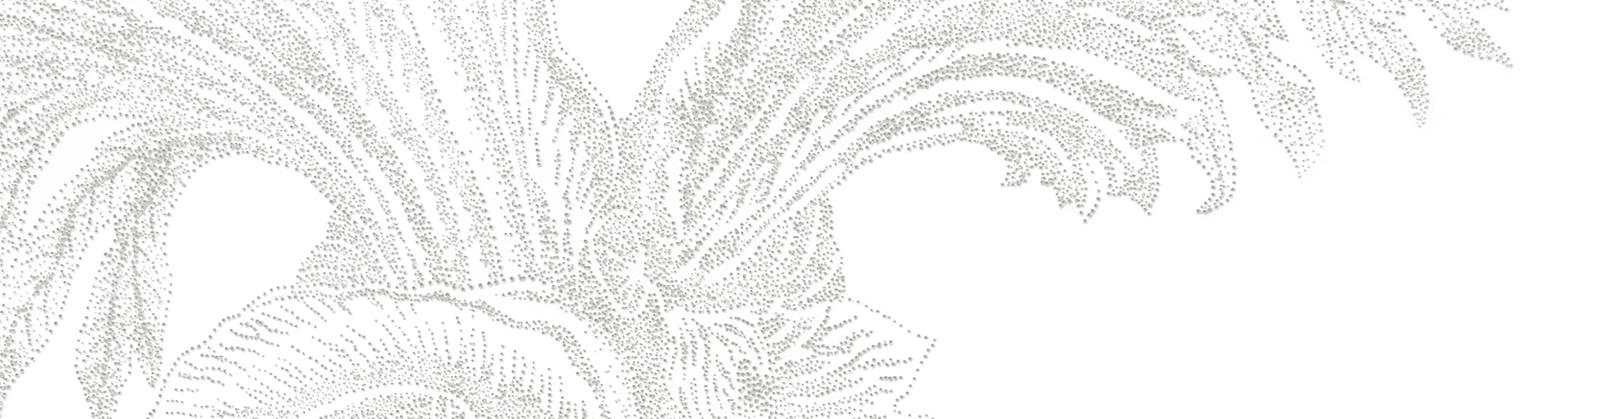 Eudes Menichetti – Indigeste – Galerie Eko Sato – detail blanc